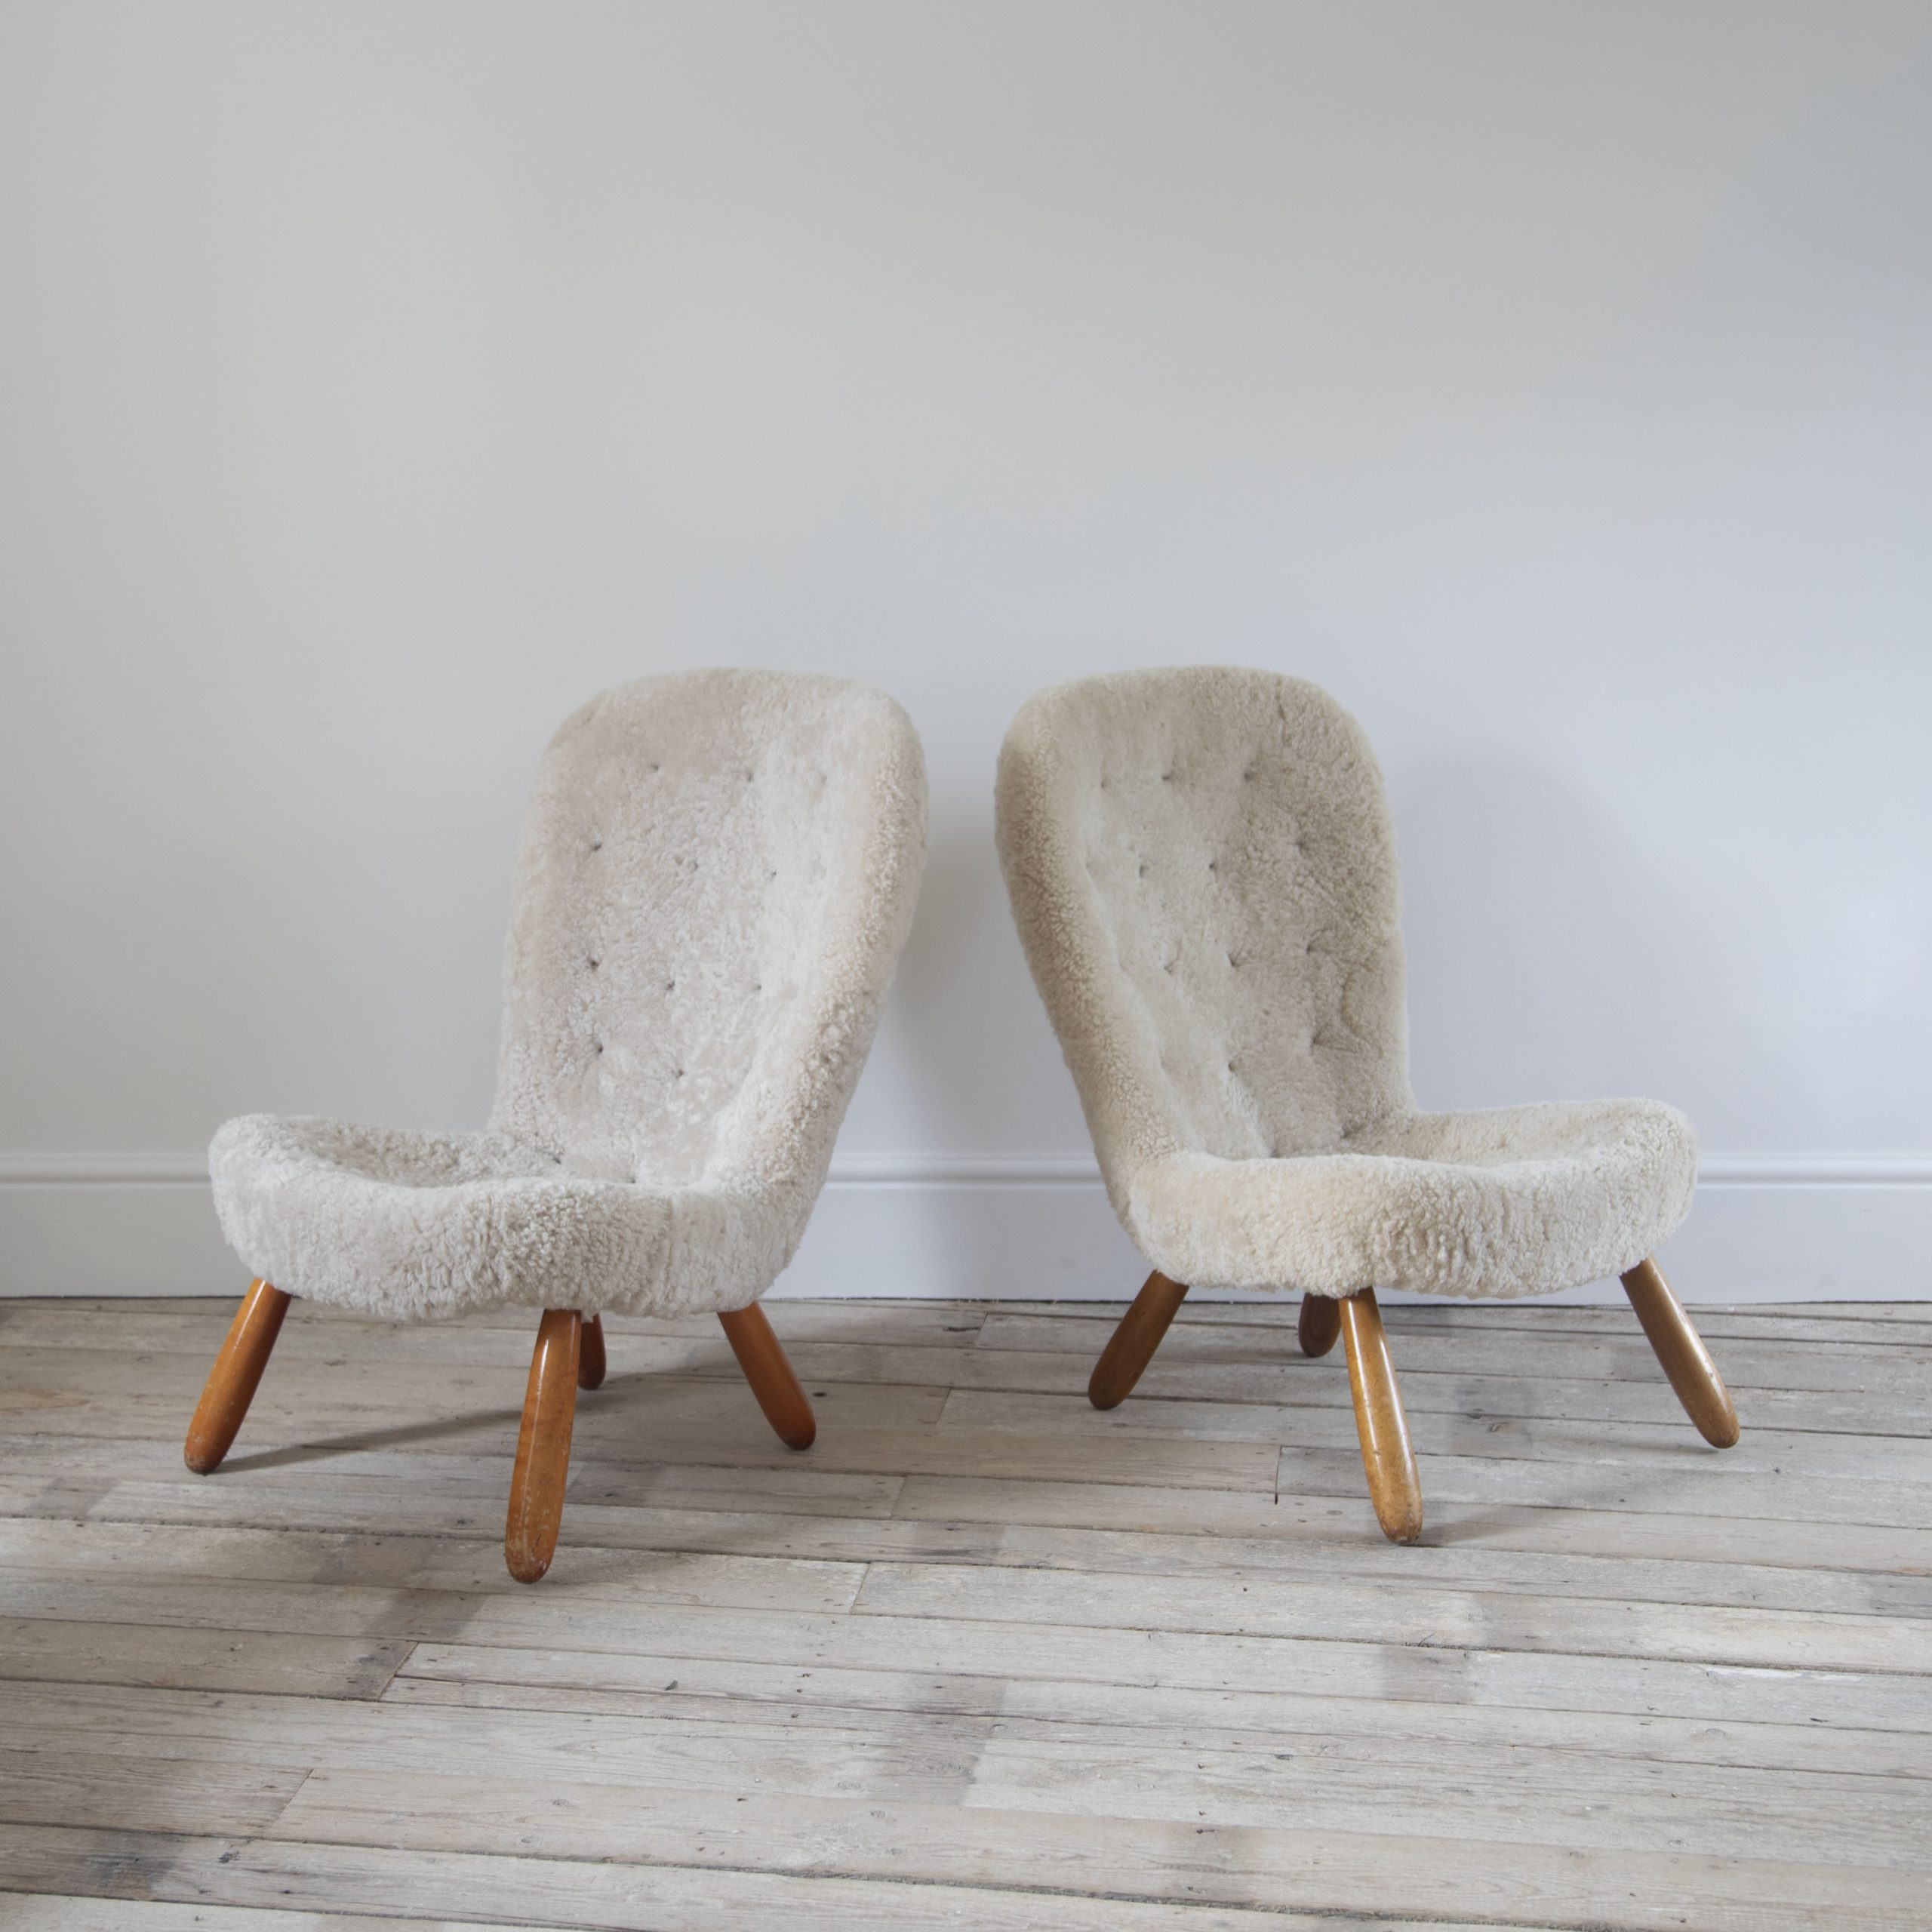 Pair of Philip Arctander Chairs